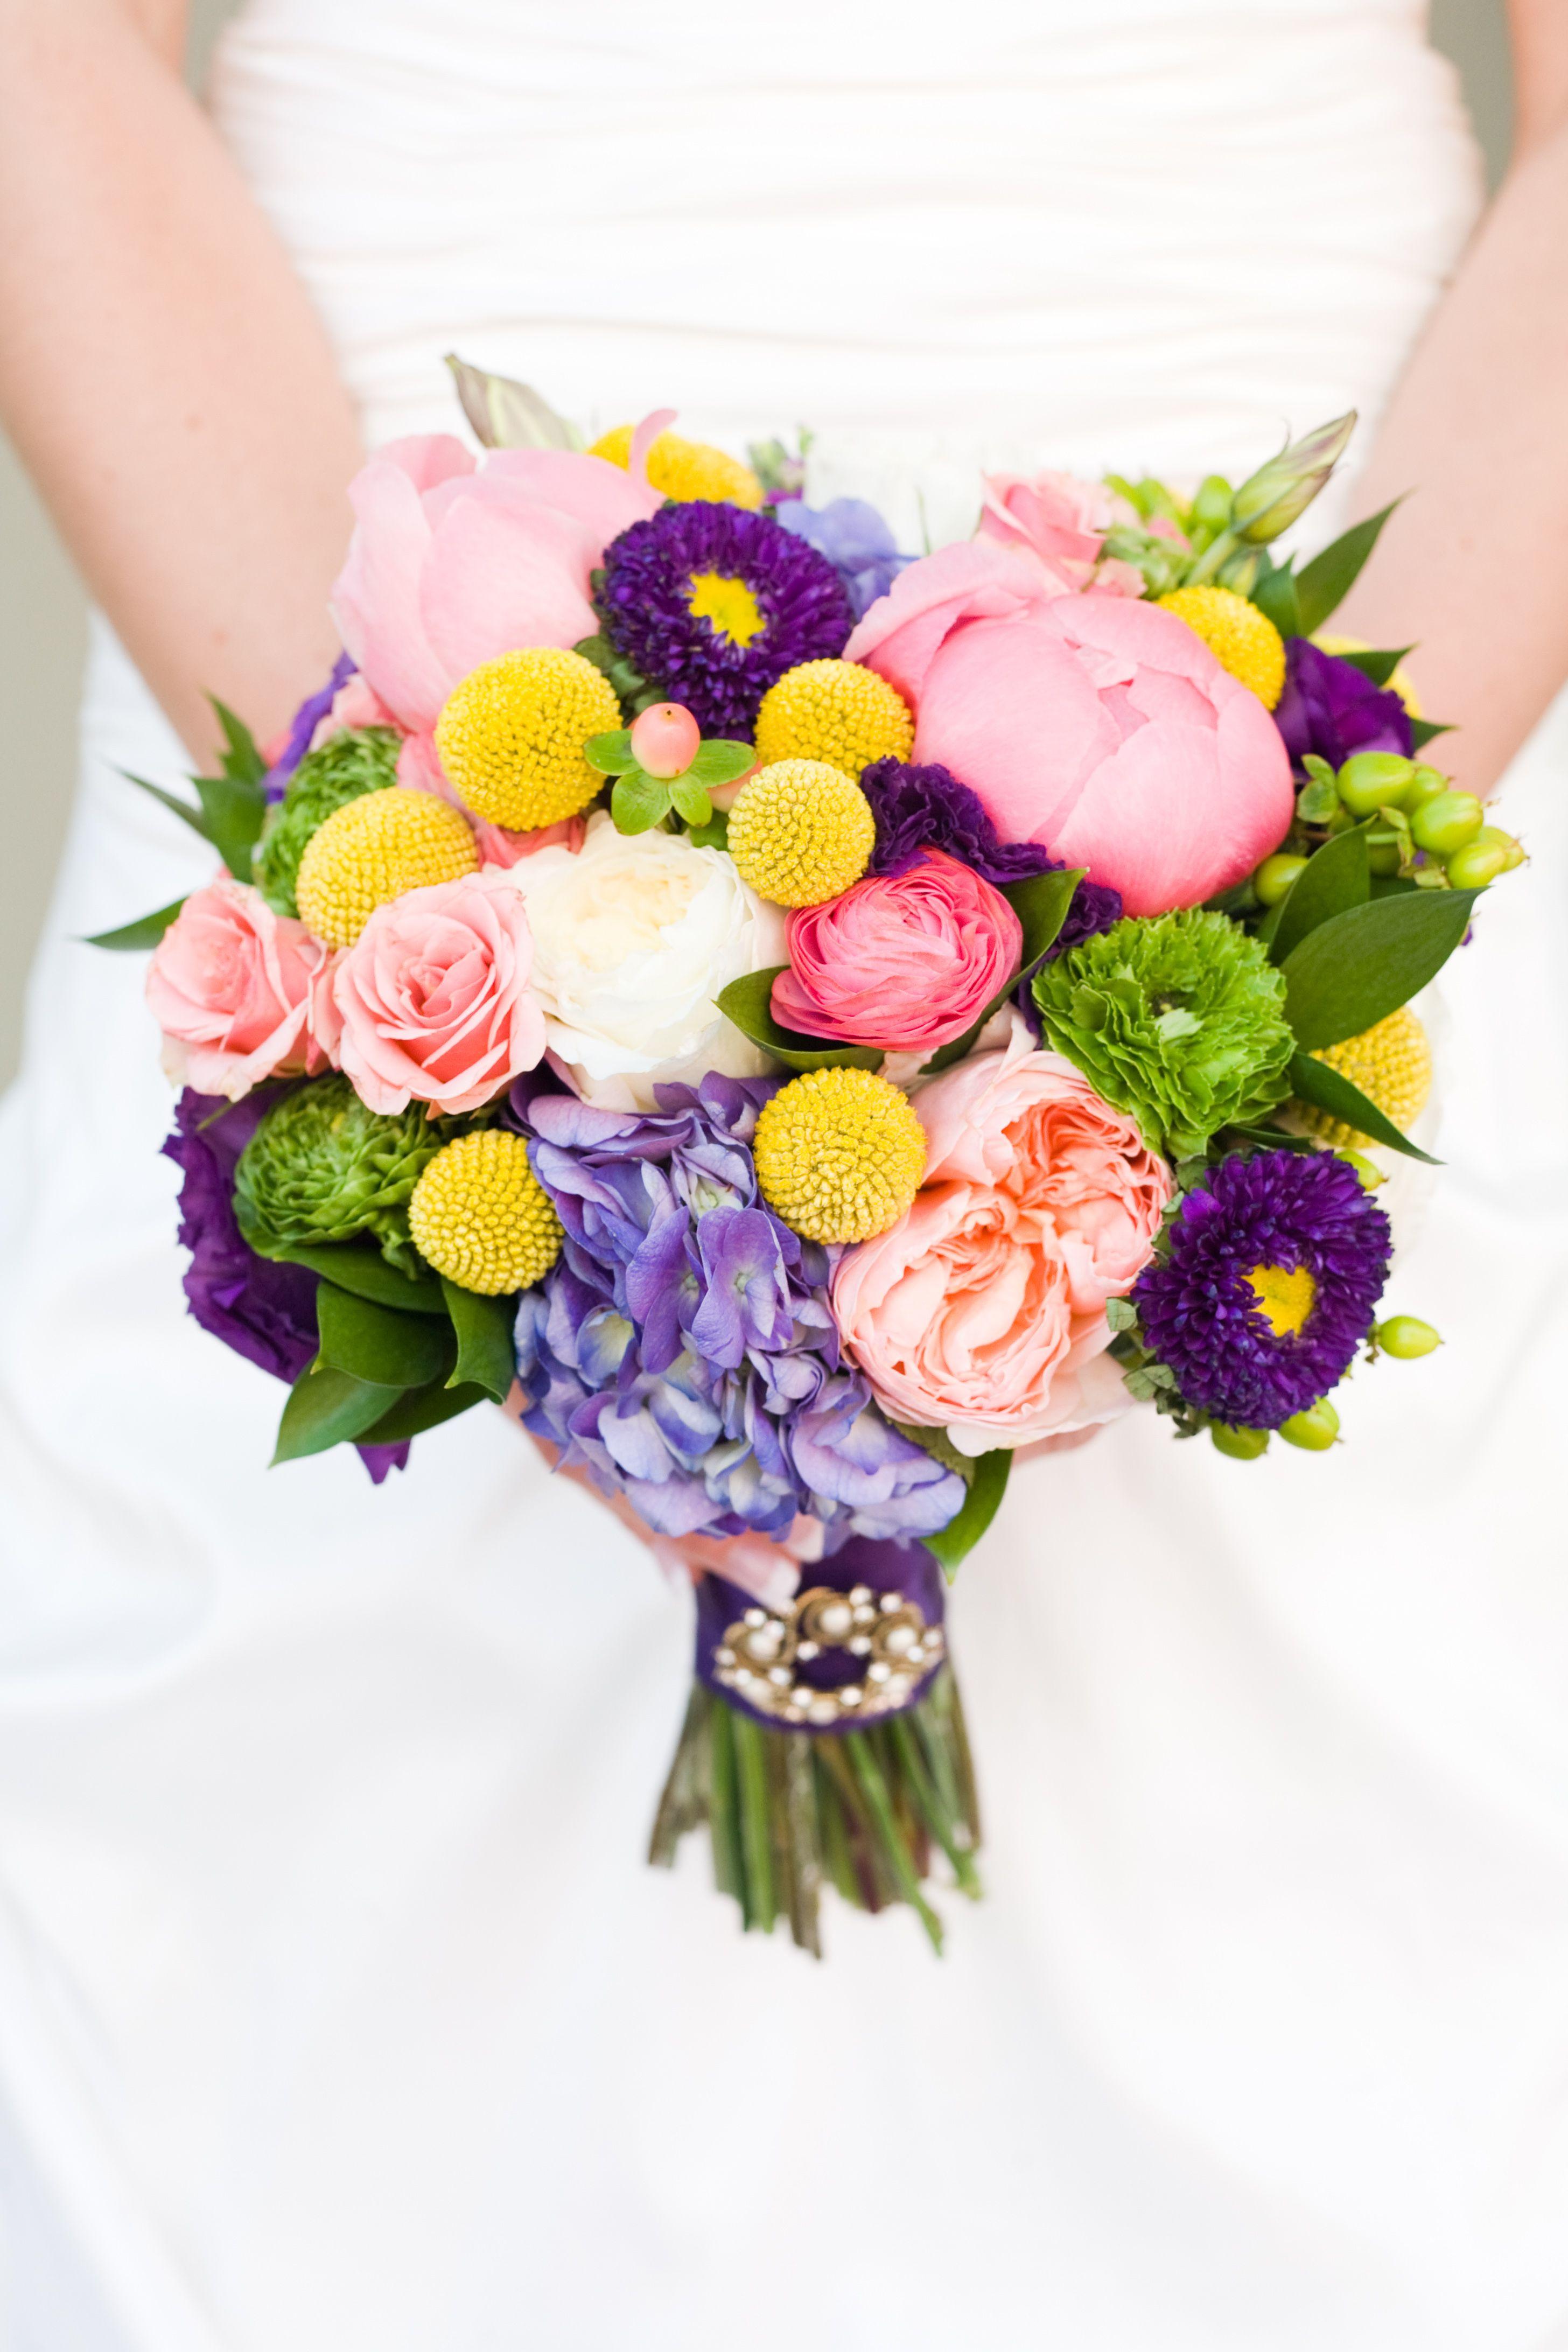 coral peony garden rose hydrangea ranunculus billy ball wedding